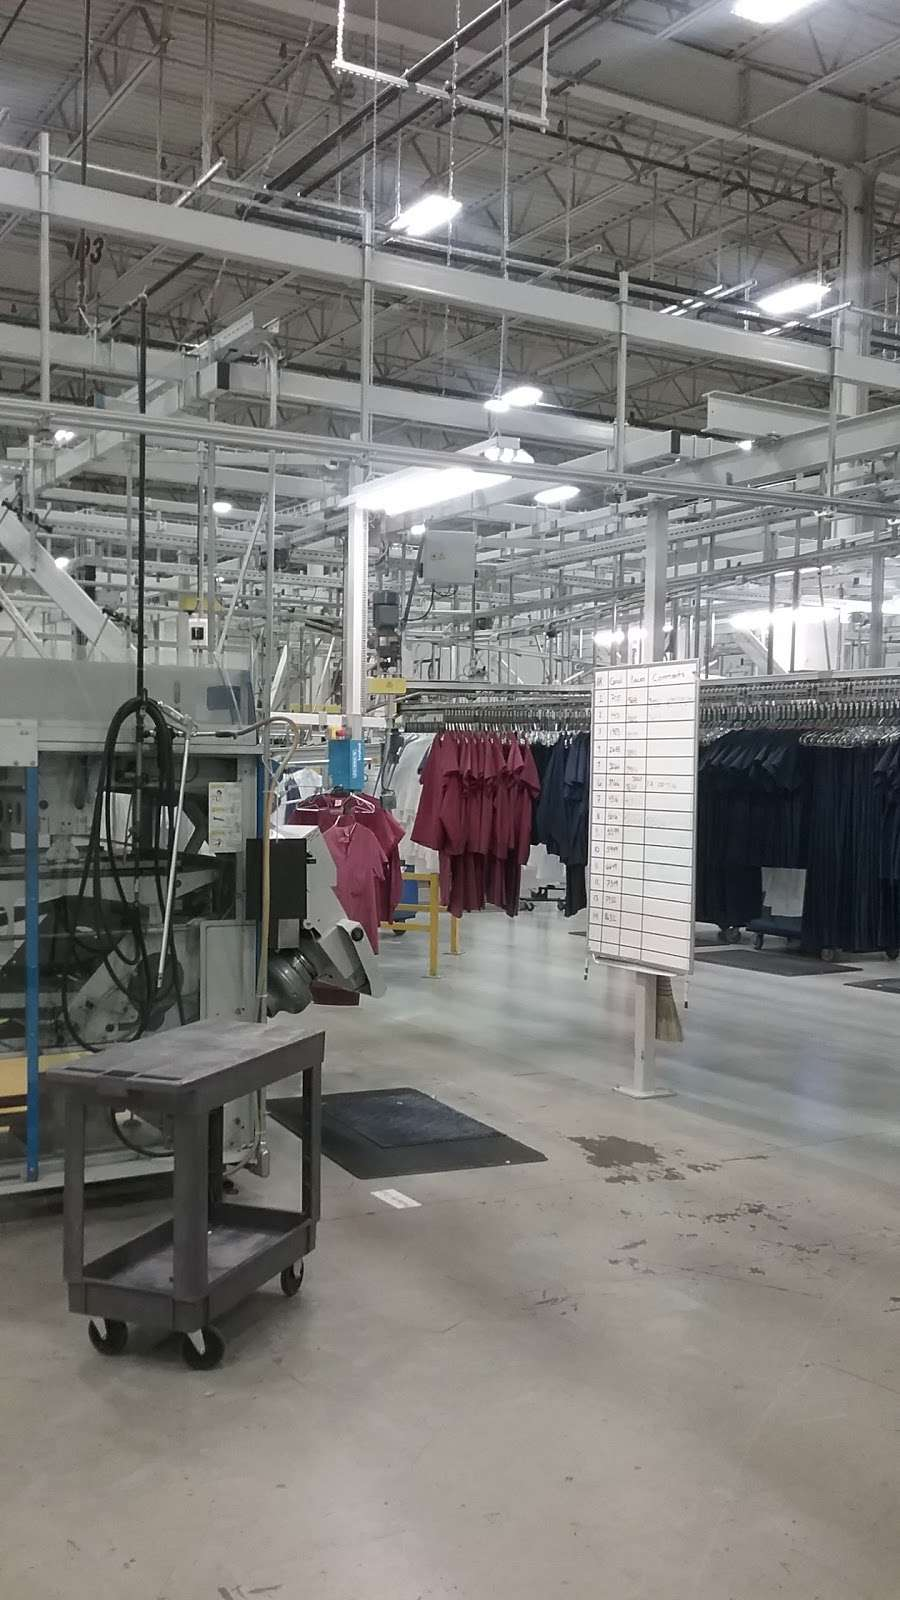 Nixon Uniform Rental Services - clothing store  | Photo 6 of 10 | Address: 500 Centerpoint Blvd, New Castle, DE 19720, USA | Phone: (302) 325-2875